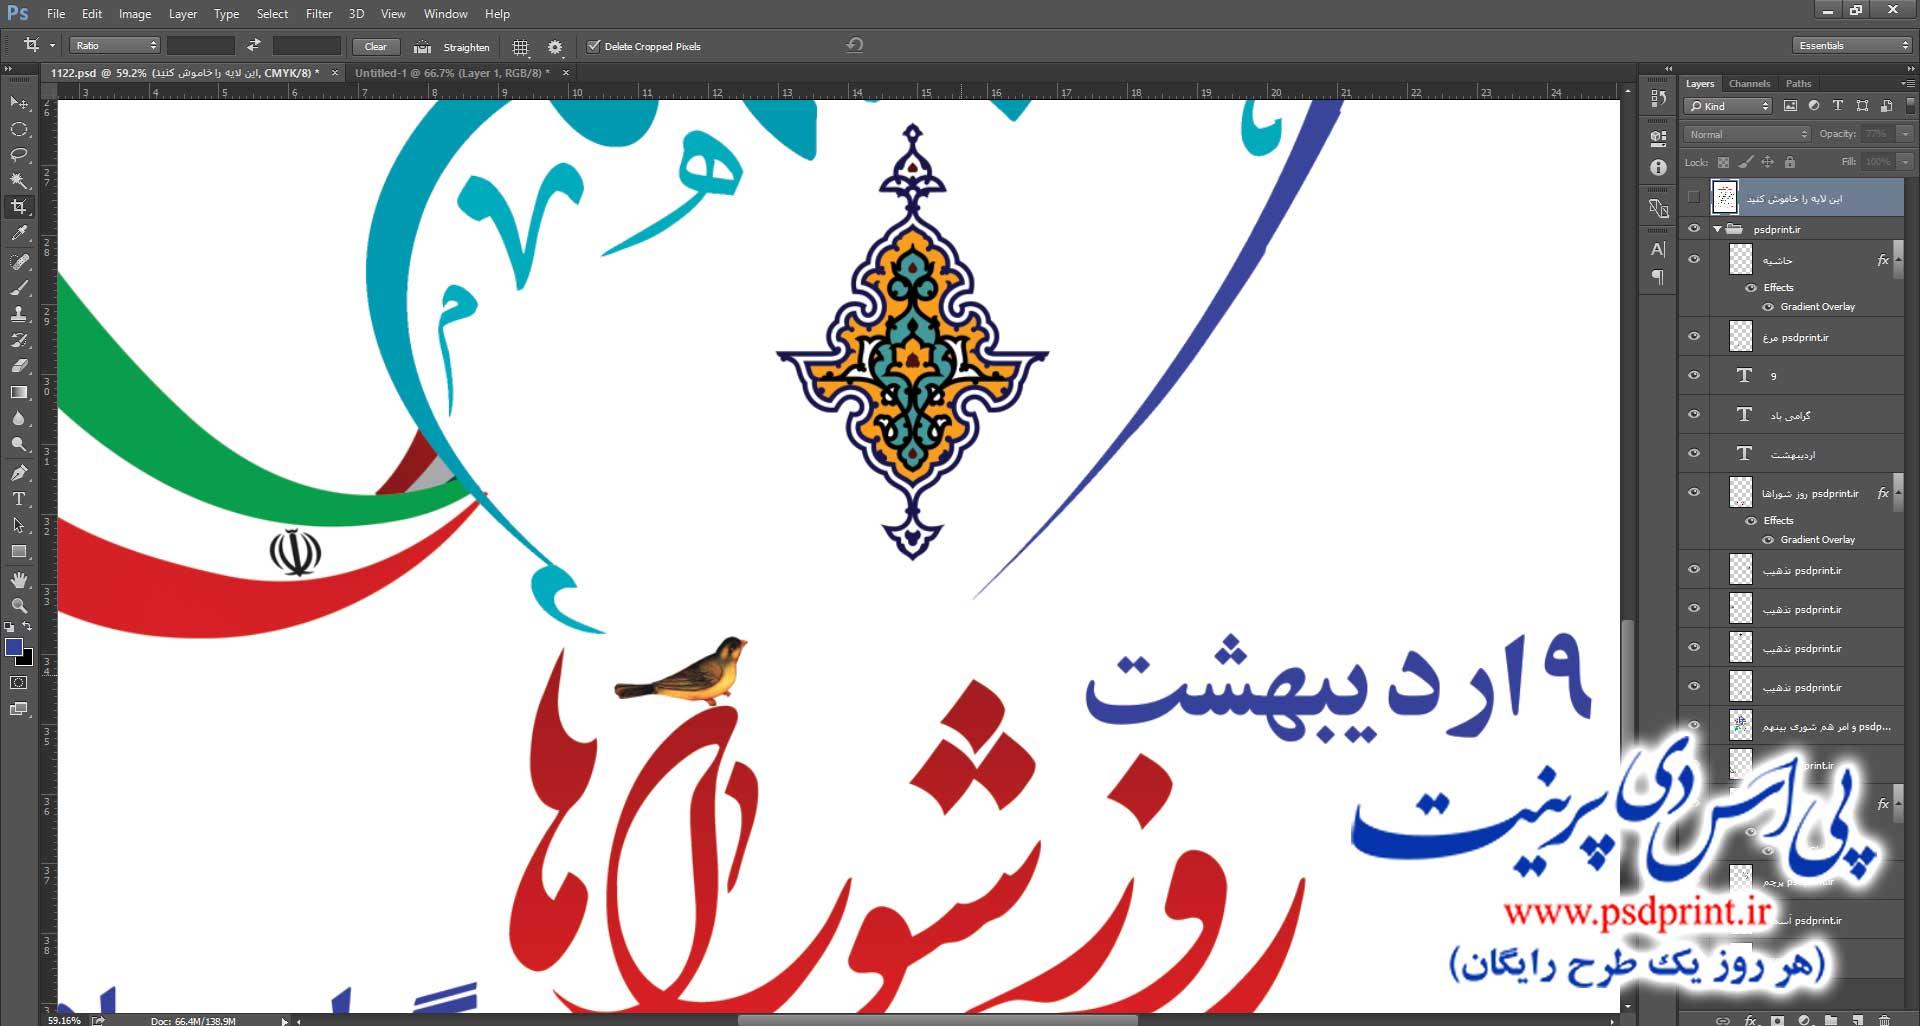 بنر+روز+شوراها